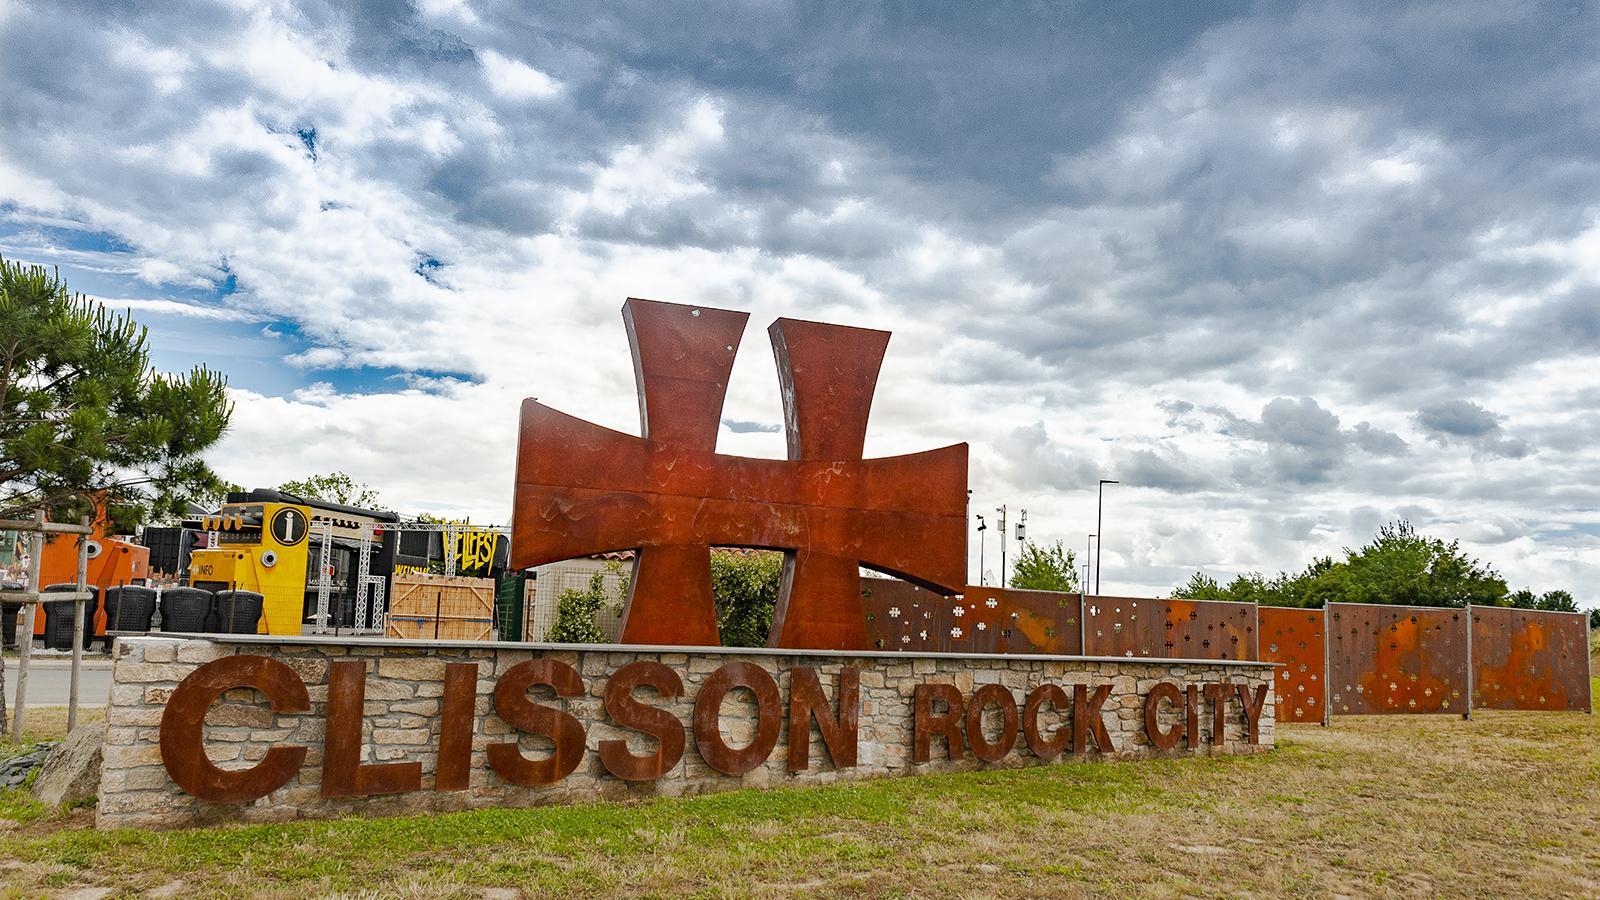 Clisson: Rock City - dank des Hellfest, des zweitgrößten Hartrockfestivals Europas. Foto: Hilke Maunder